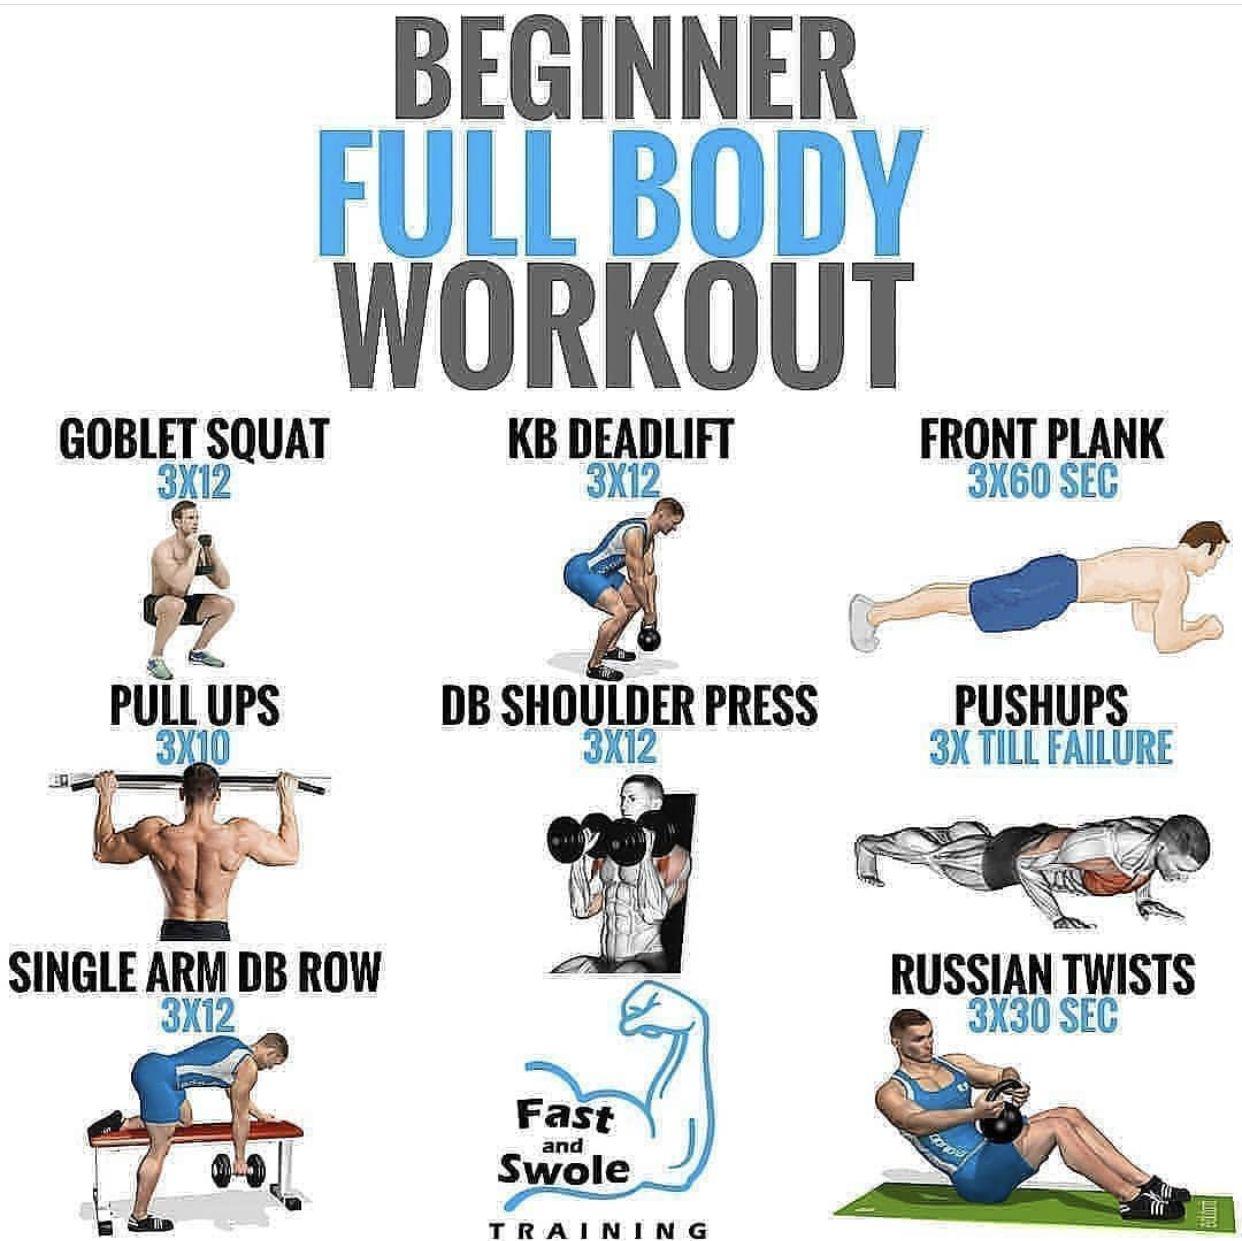 Idea by Rashad Jamaal Robinson on Fitness Beginner full